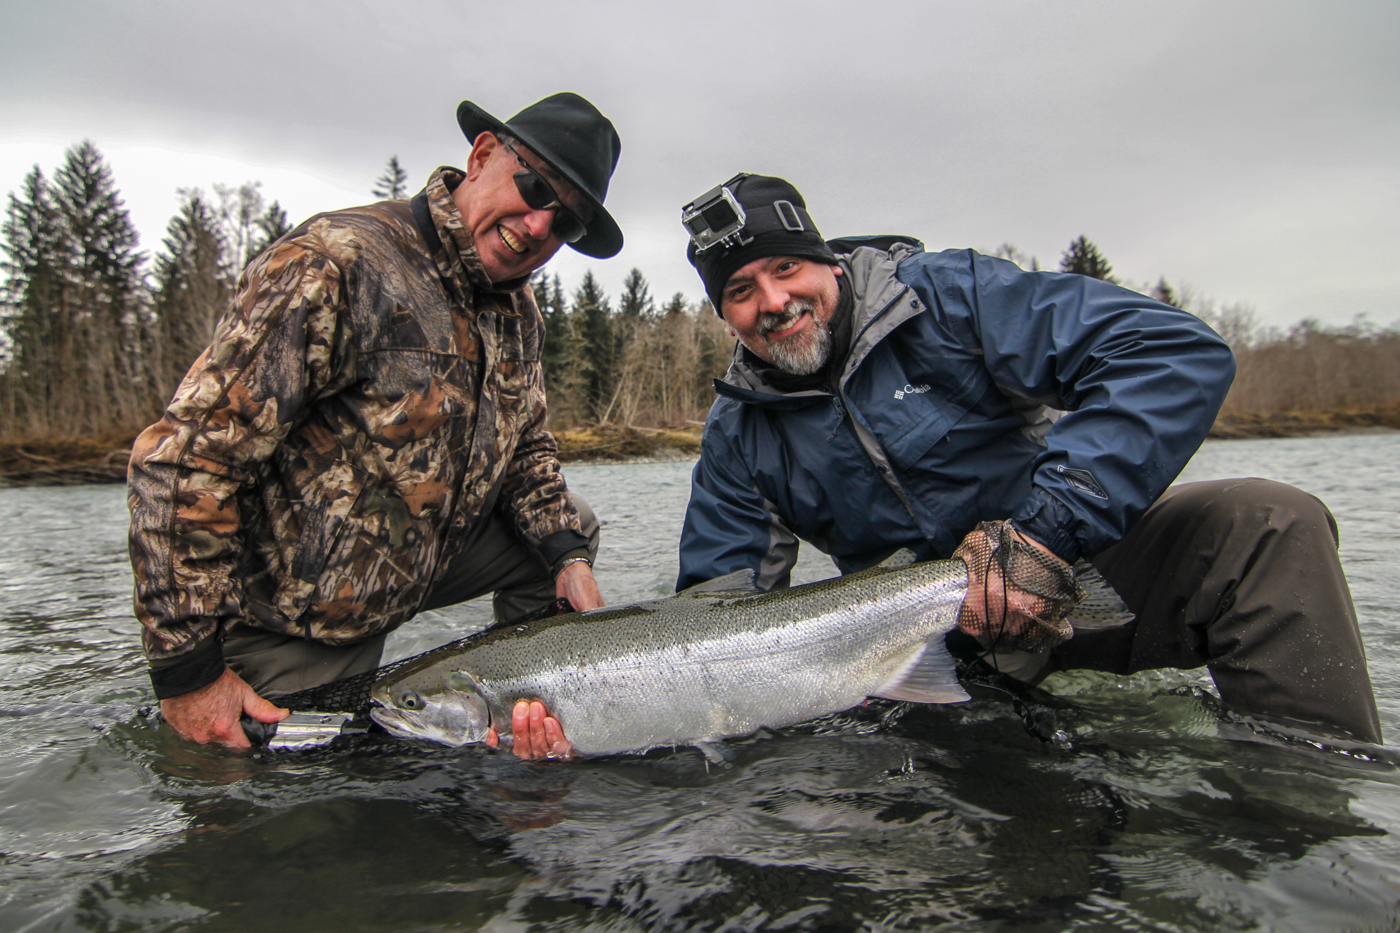 Washington State Winter Steelhead Fly Fishing - Forks Washington Fly Fishing - Seattle WA Fly Fishing Guides